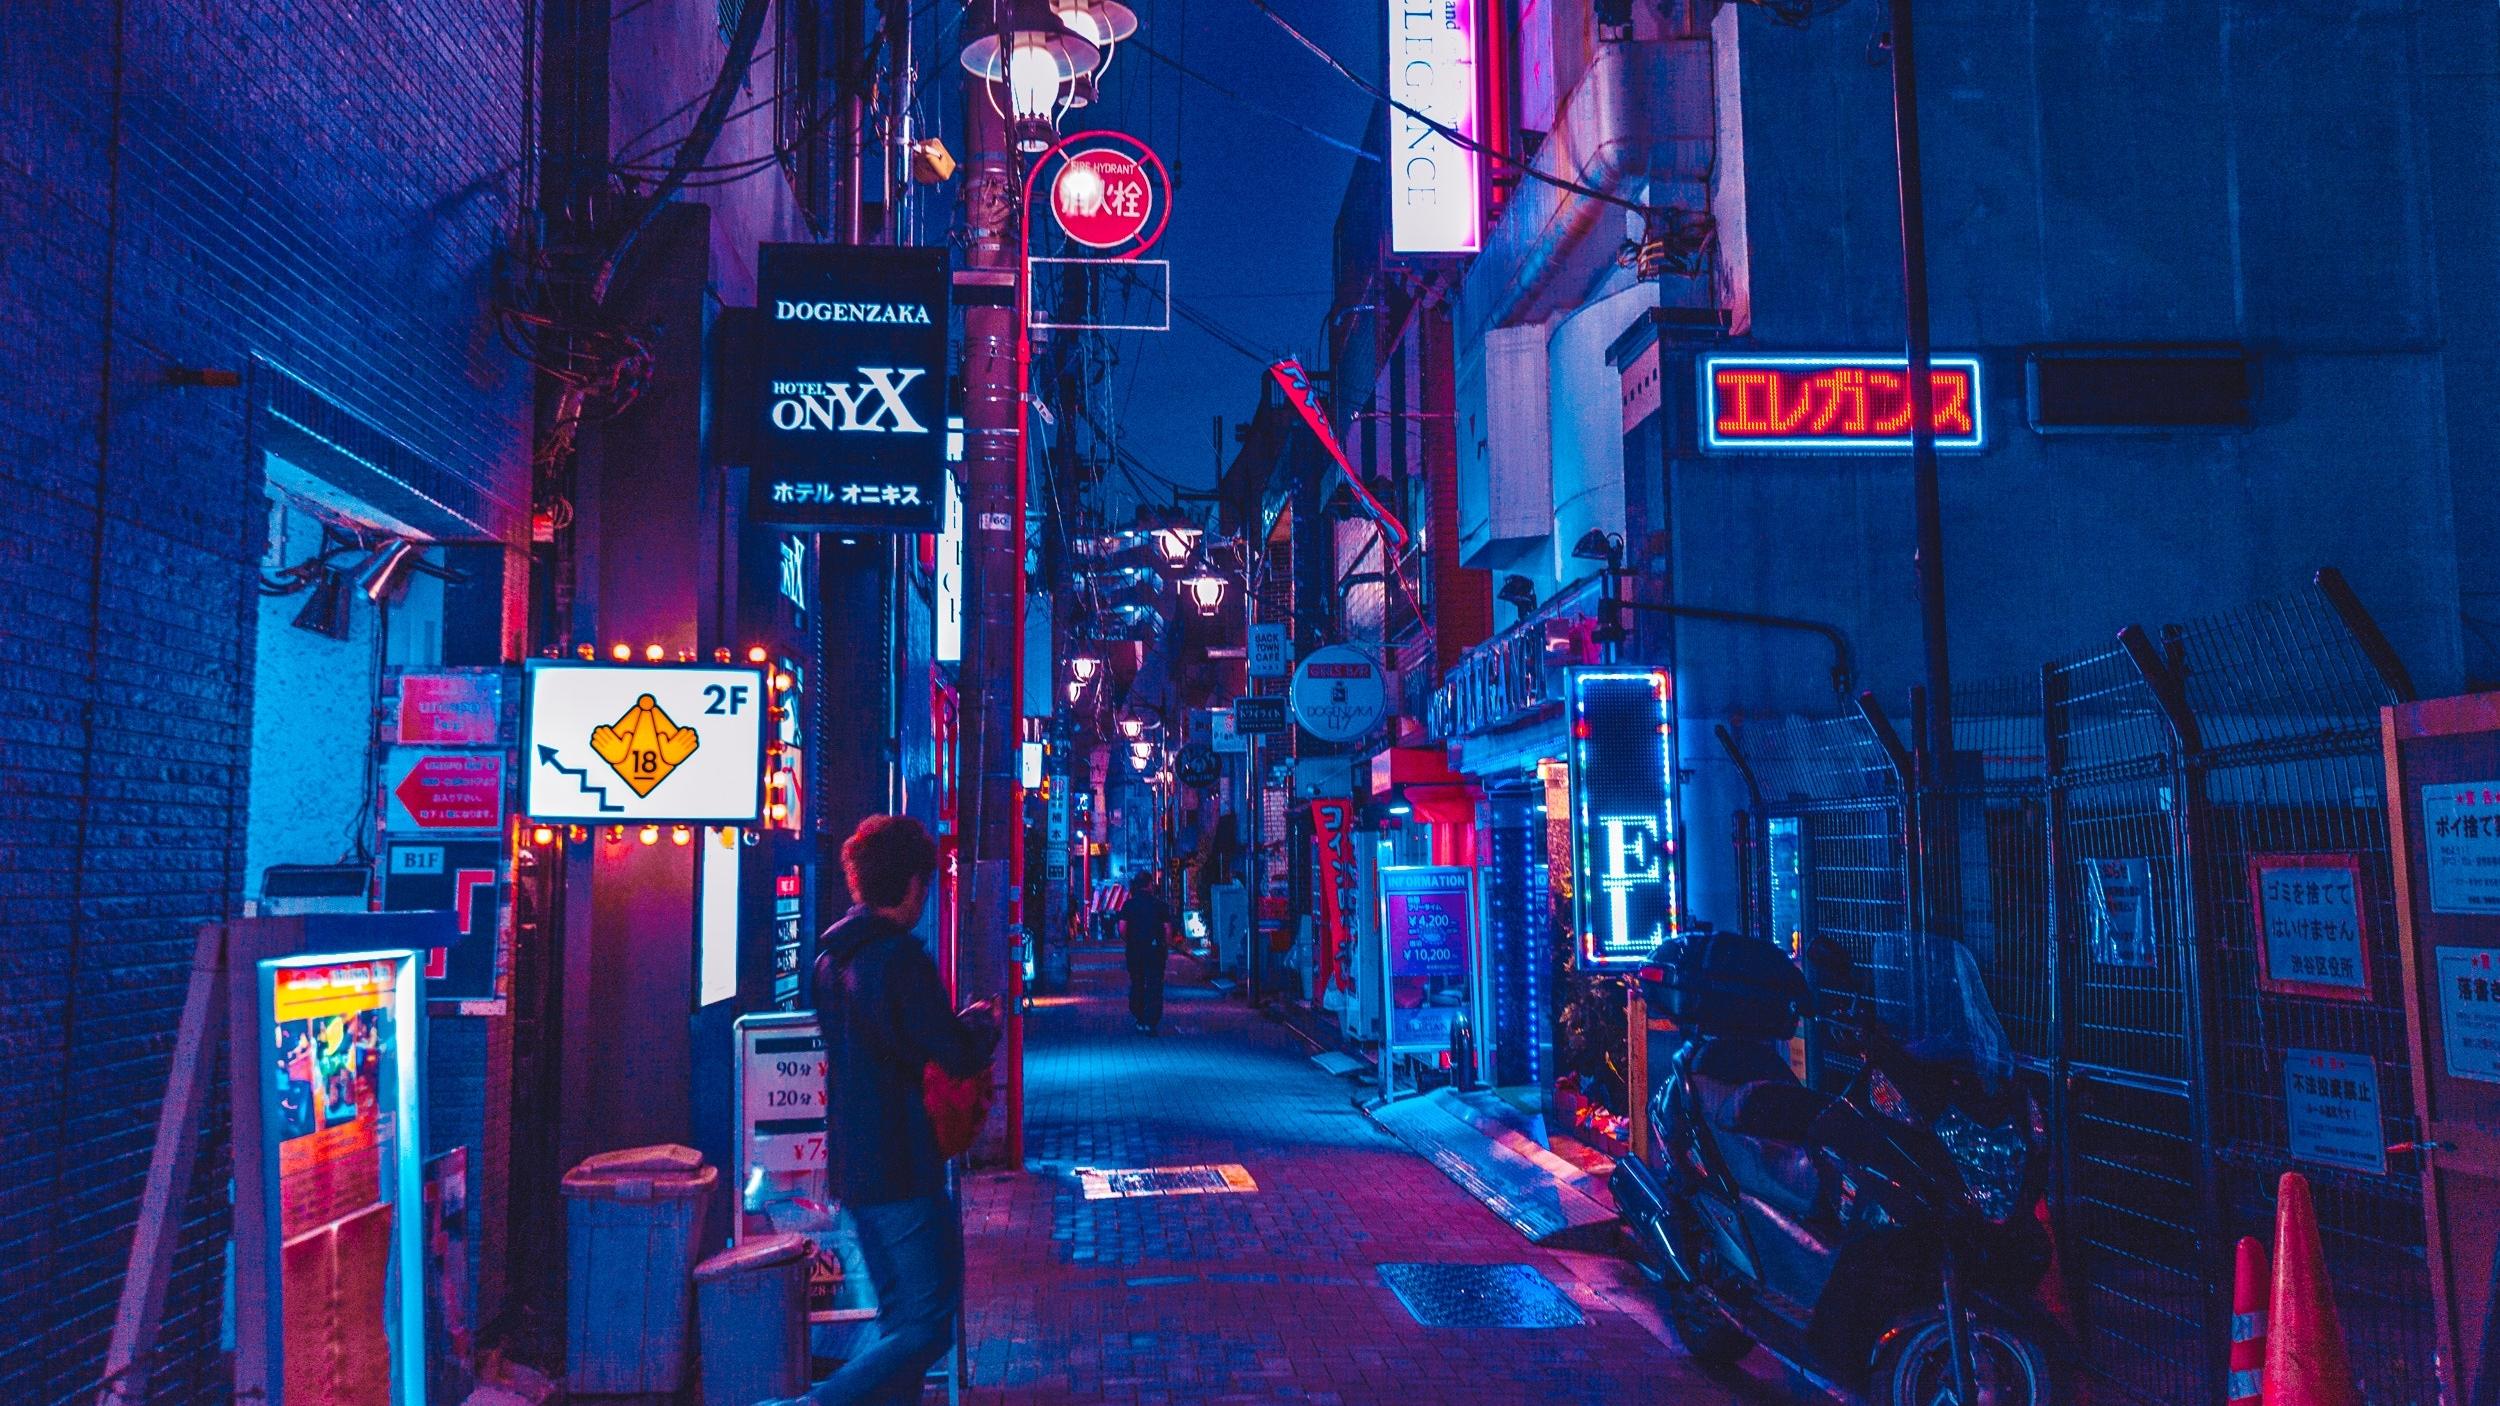 TOKYO STREETS ILLUMINATED BY NEON. CREDIT: BENJAMIN HUNG / SHUTTERSTOCK